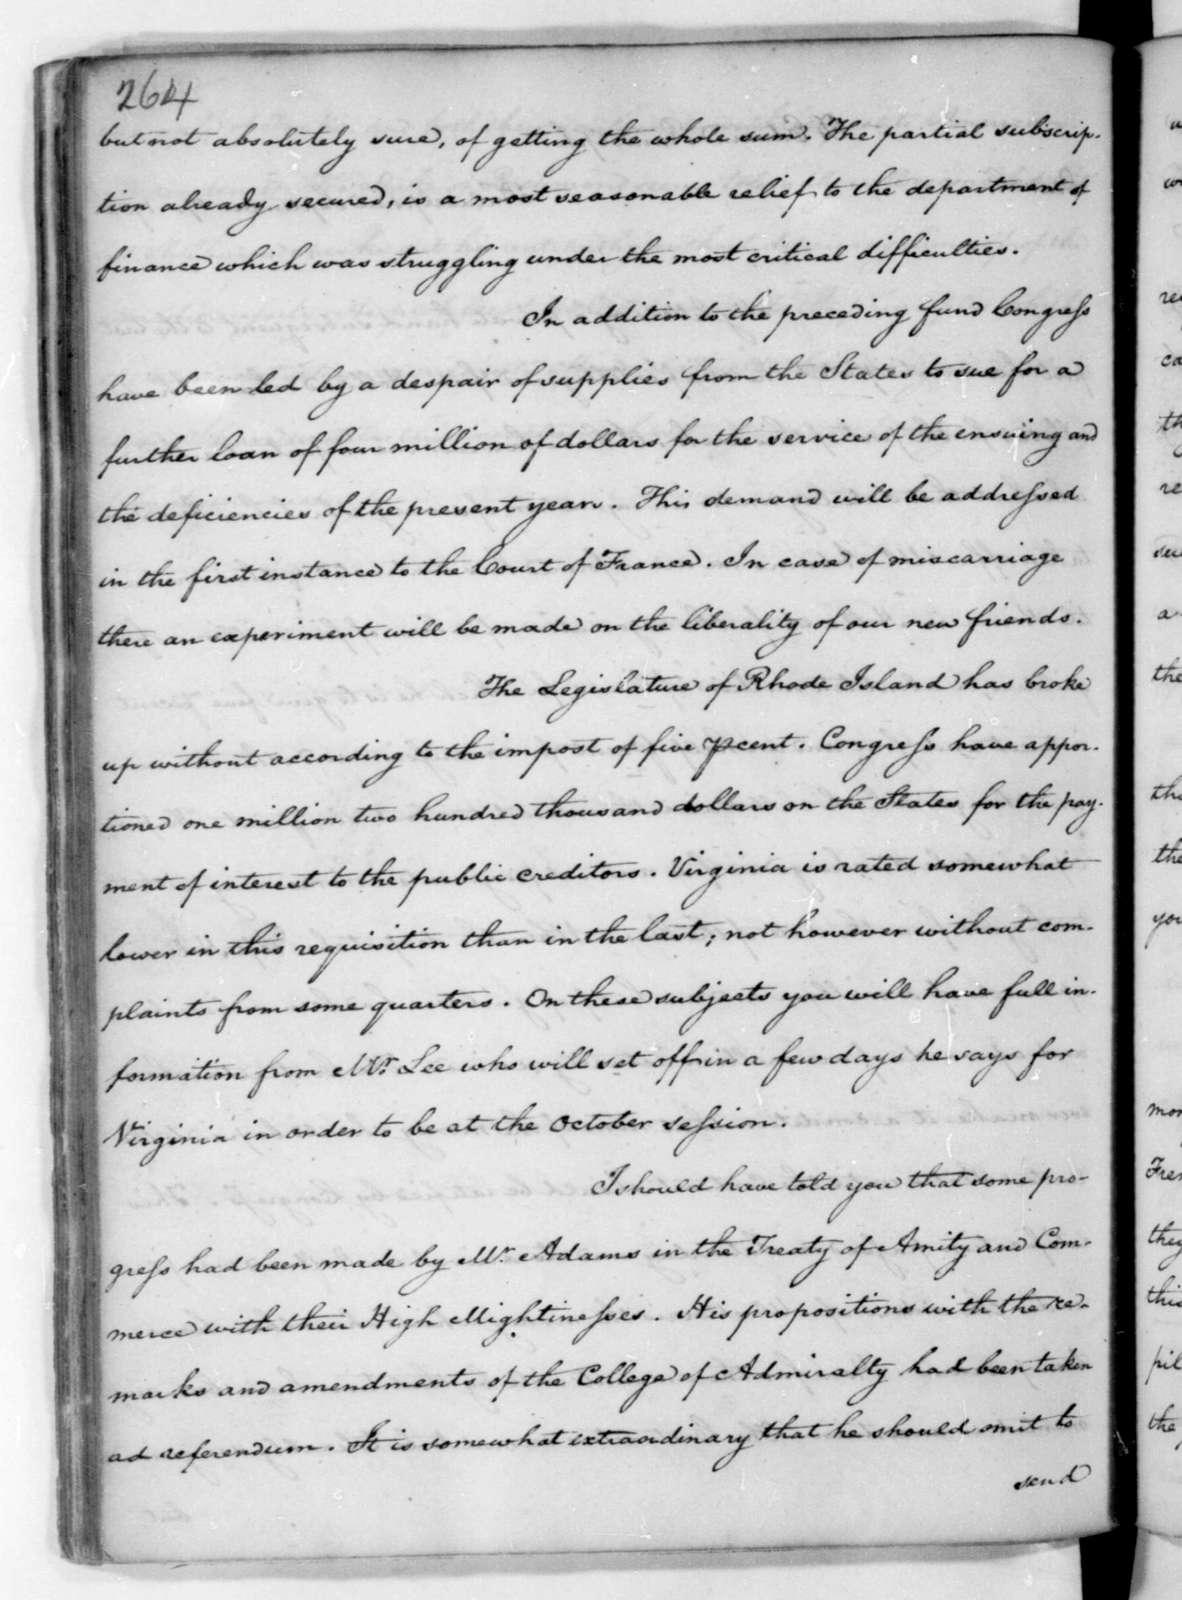 James Madison to Edmund Randolph, September 17, 1782.